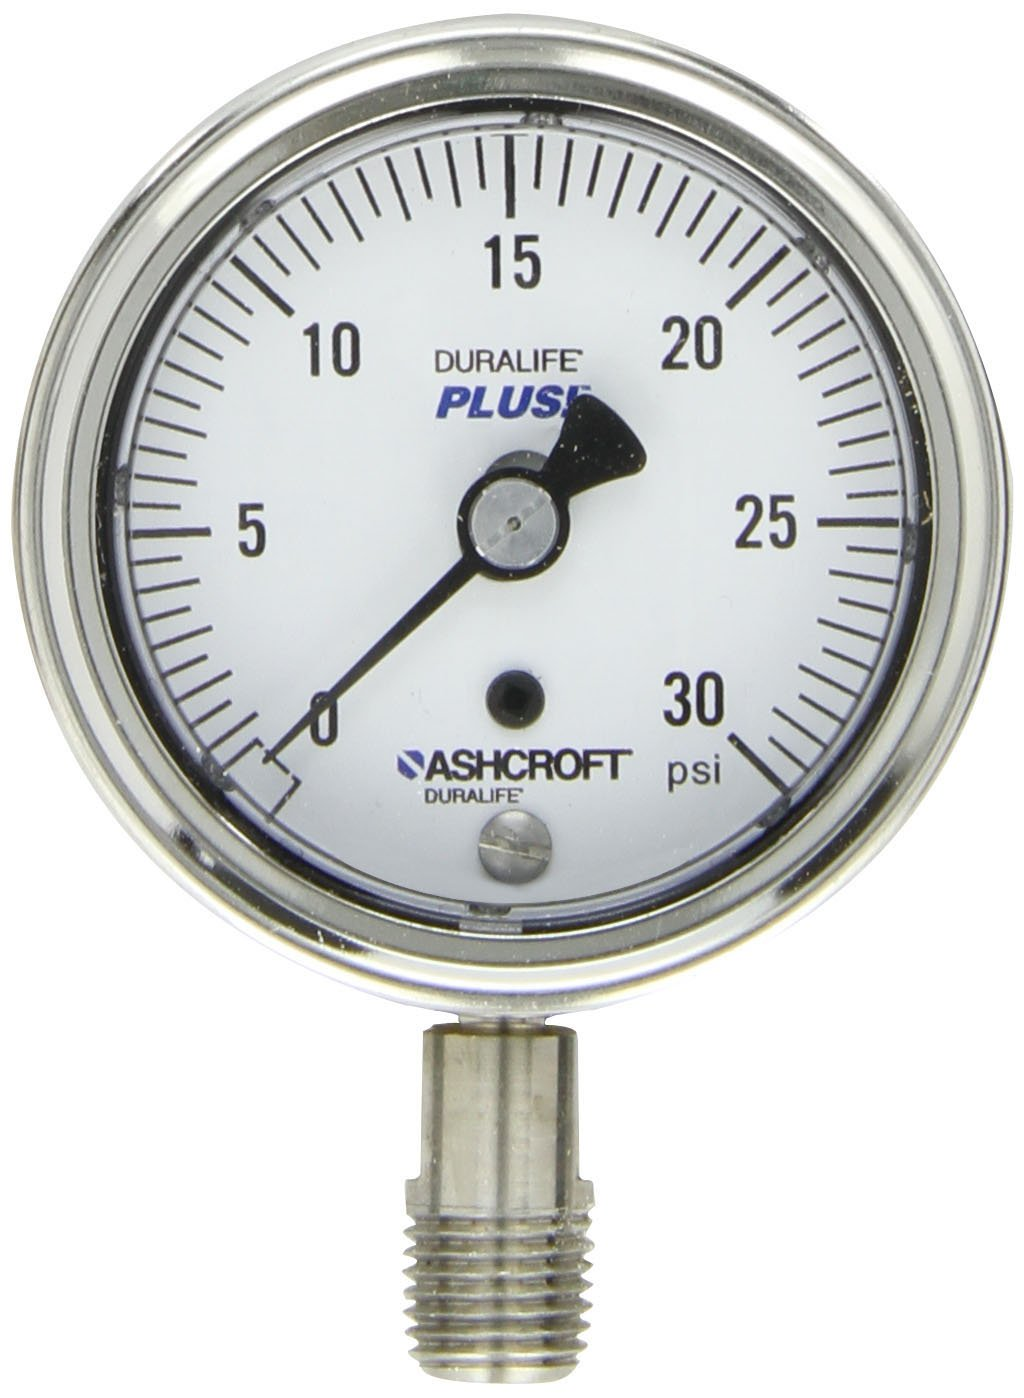 Ashcroft 25-1009-AW-02L-200#-XLJ Duralife Pressure Gauge 1//4in Npt 0-200psi